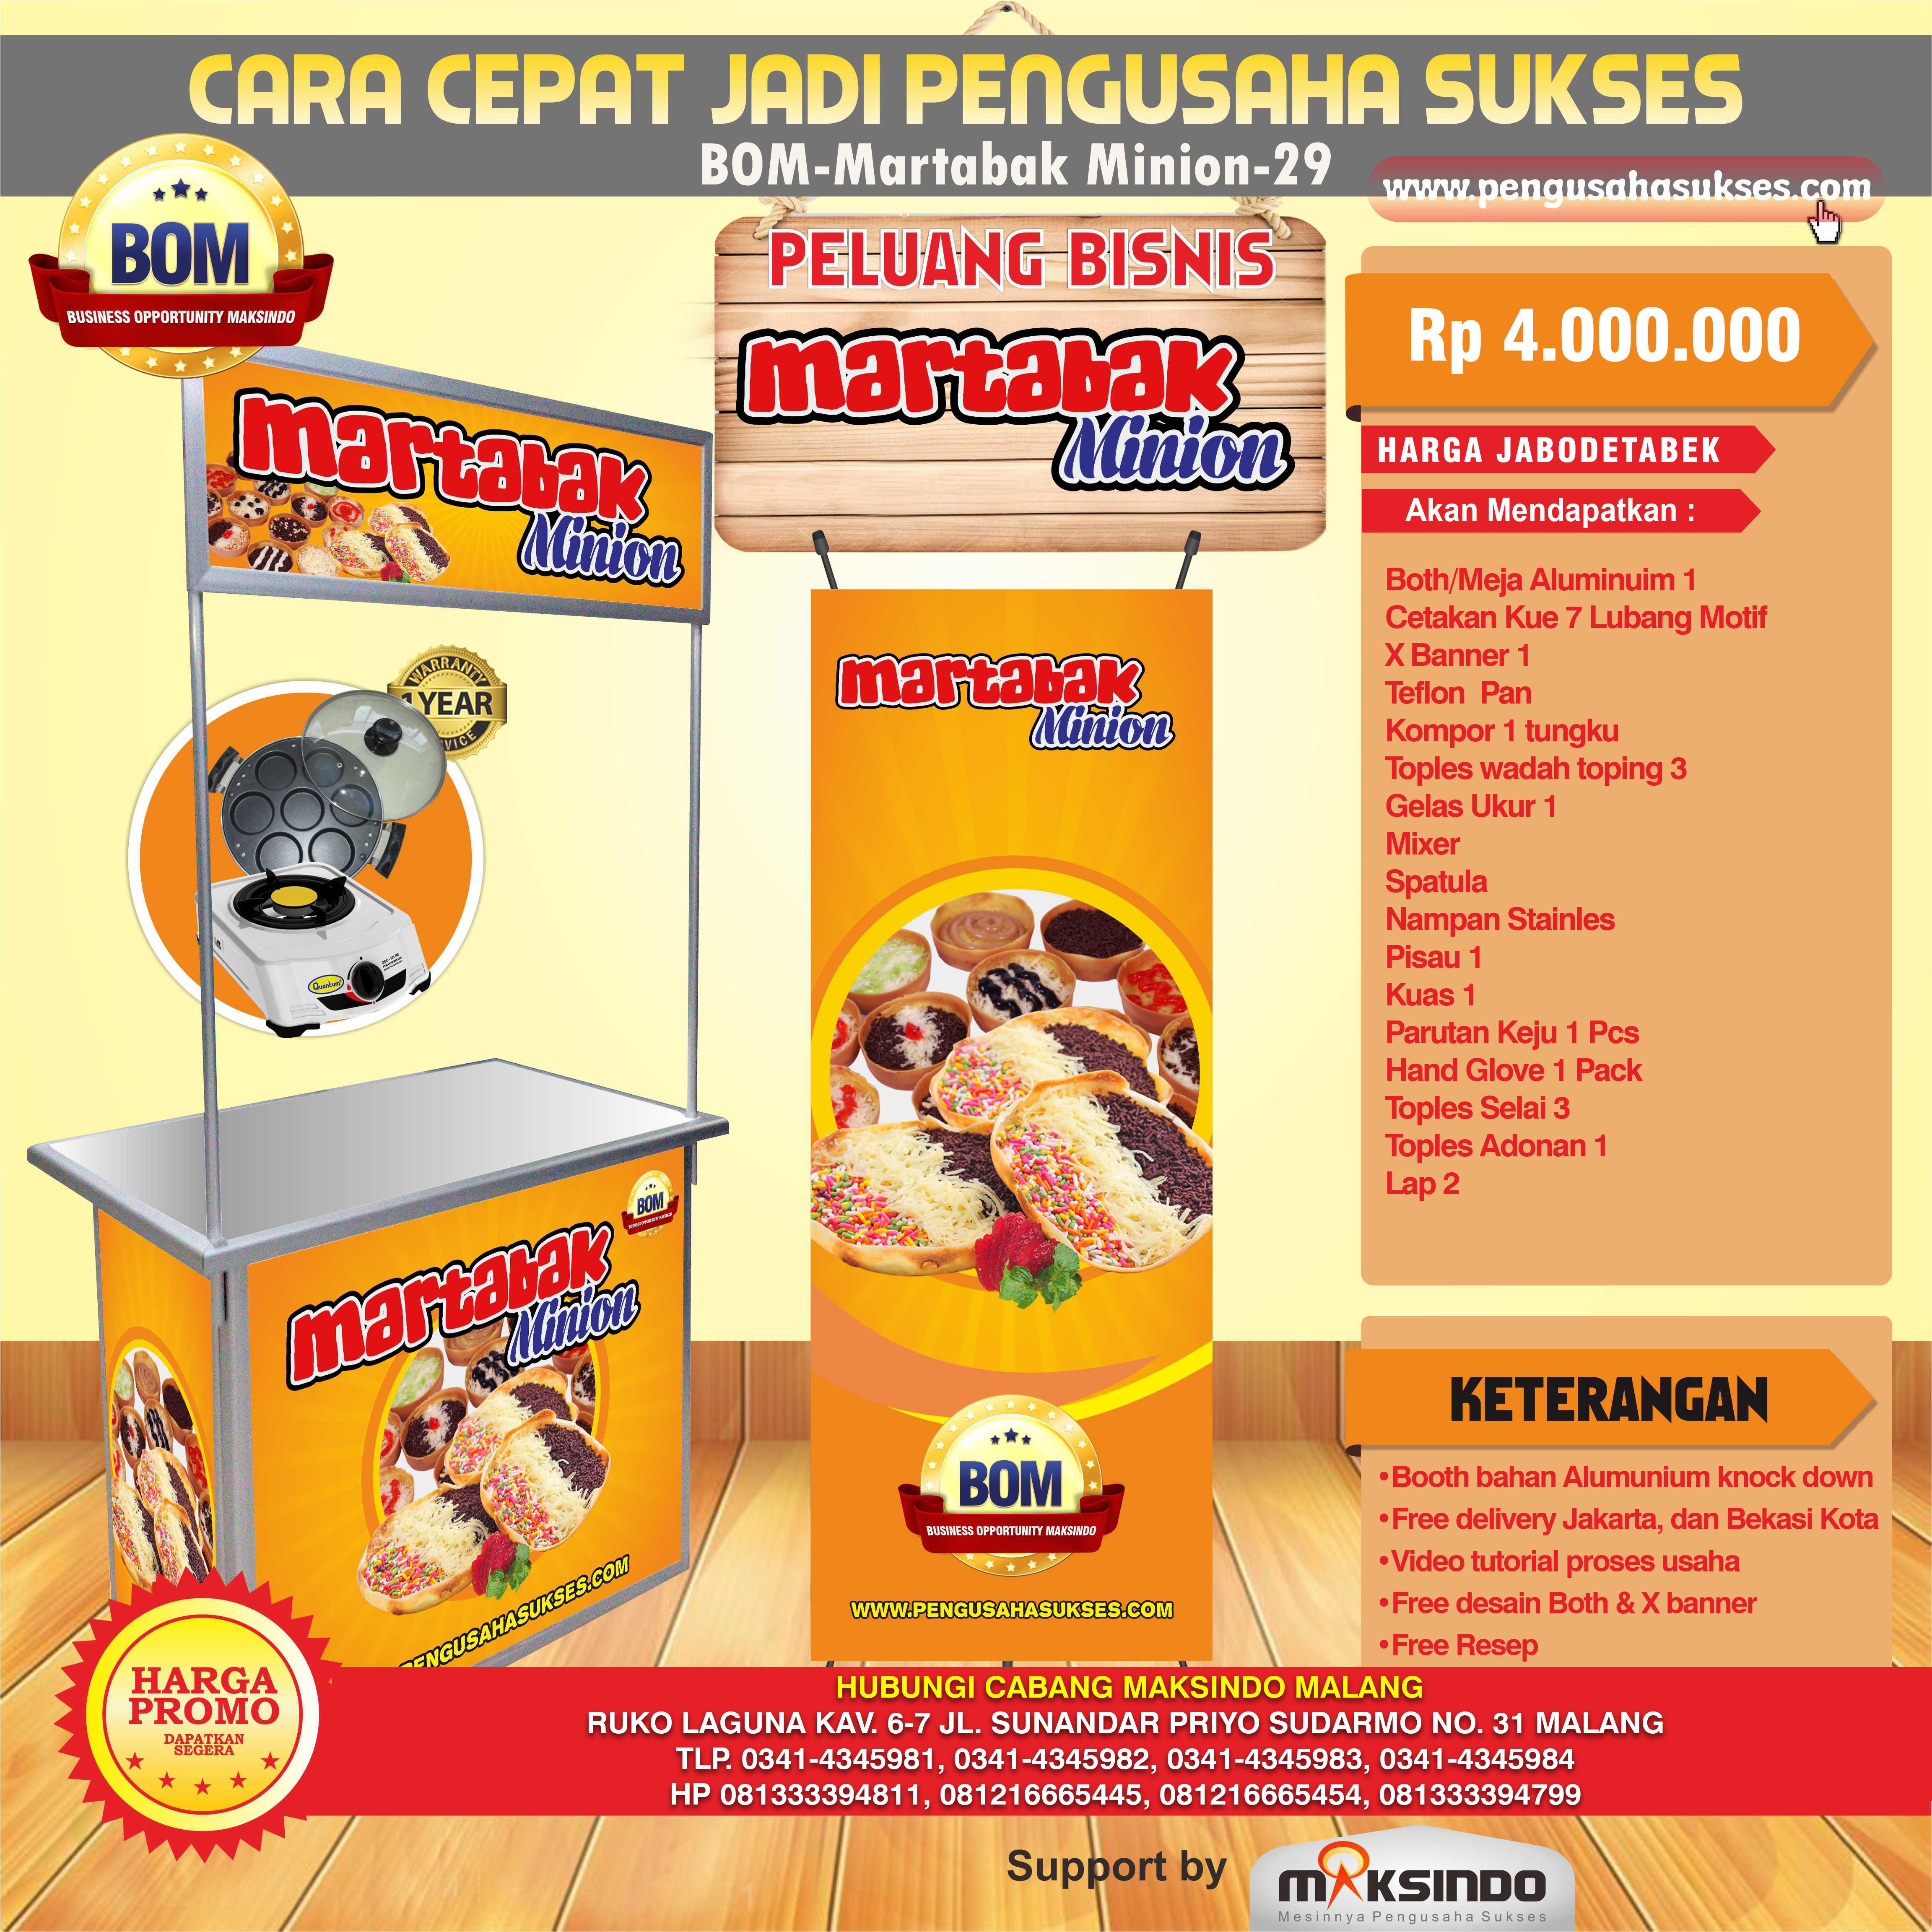 Paket Usaha Martabak Minion Program BOM